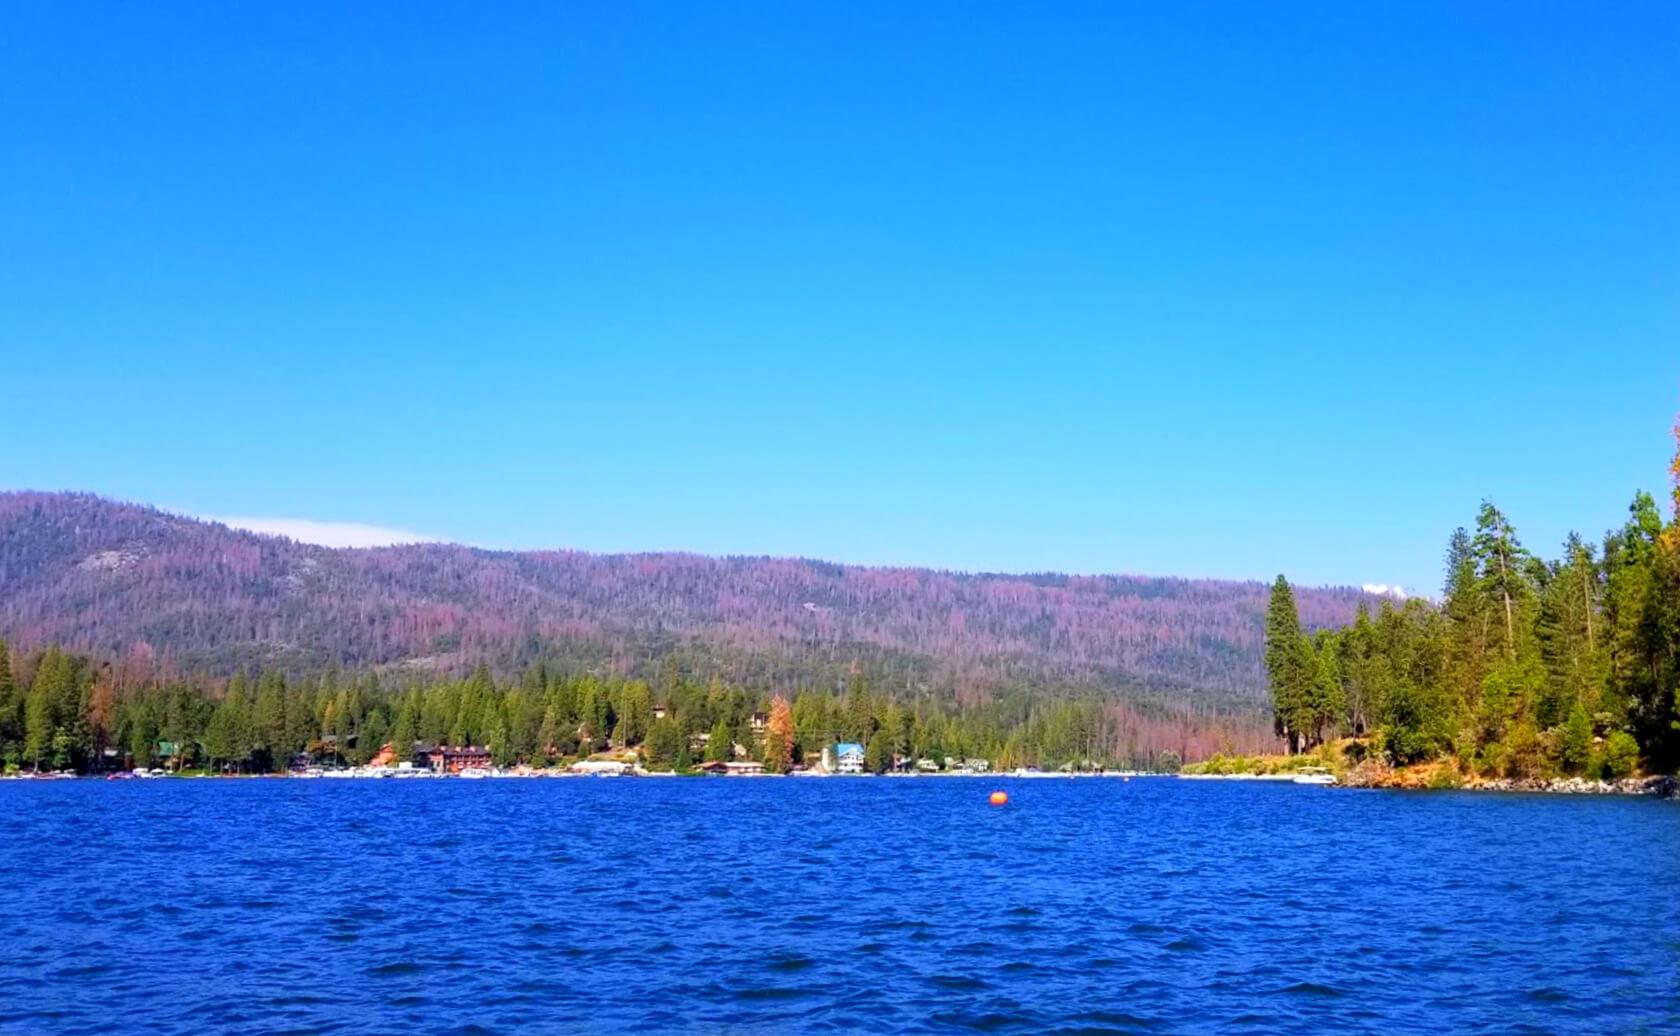 Bass-Lake-Reservoir-Fishing-Guide-Report-California-03